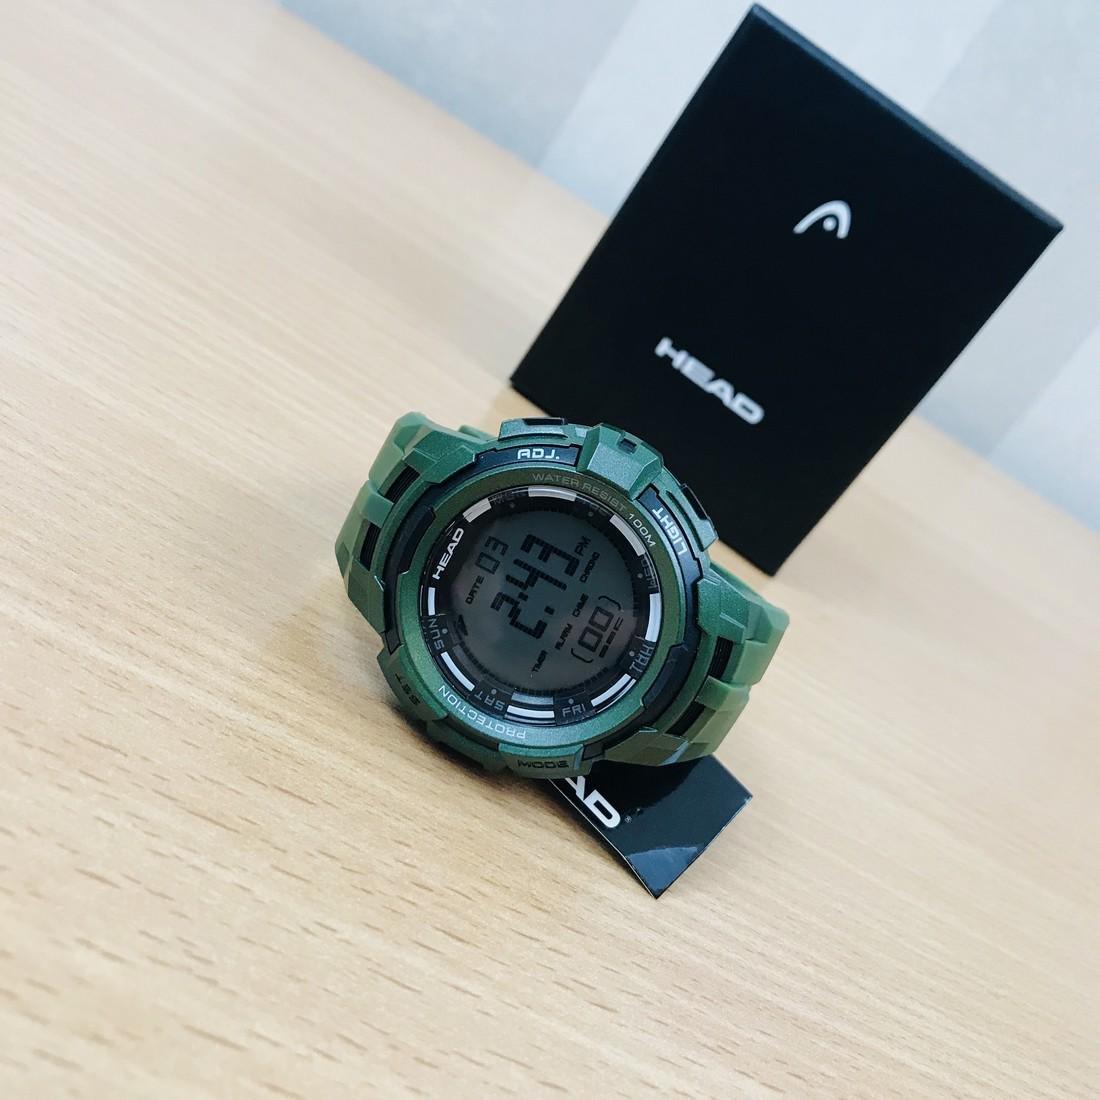 HEAD Super G Green Multifunctional Watch - 7